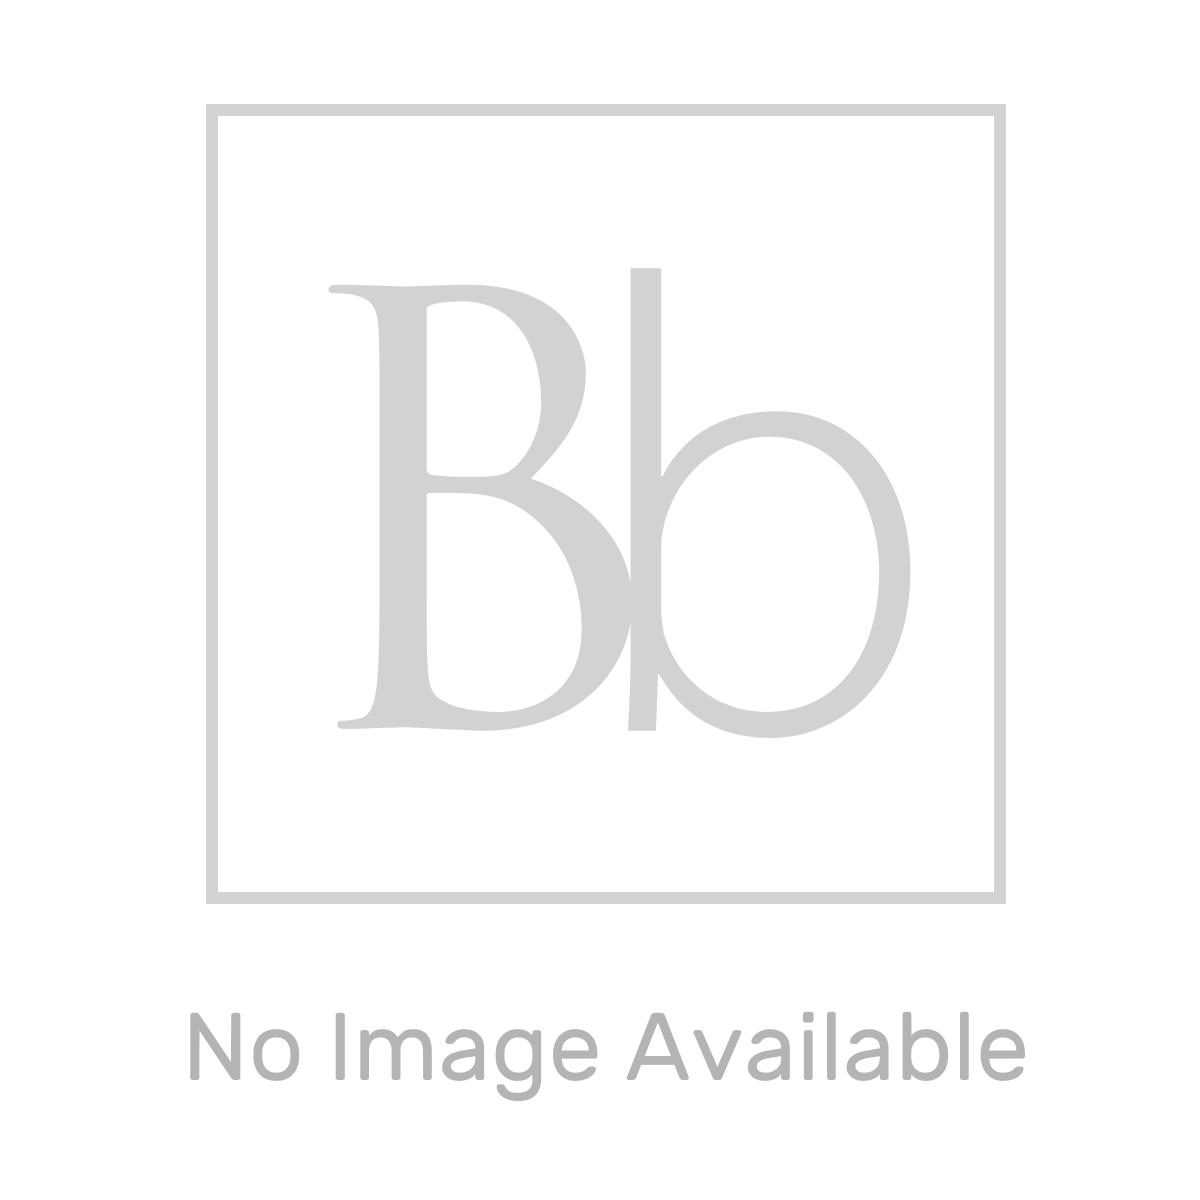 Tavistock Ethos End Bath Panel 700mm in Walnut